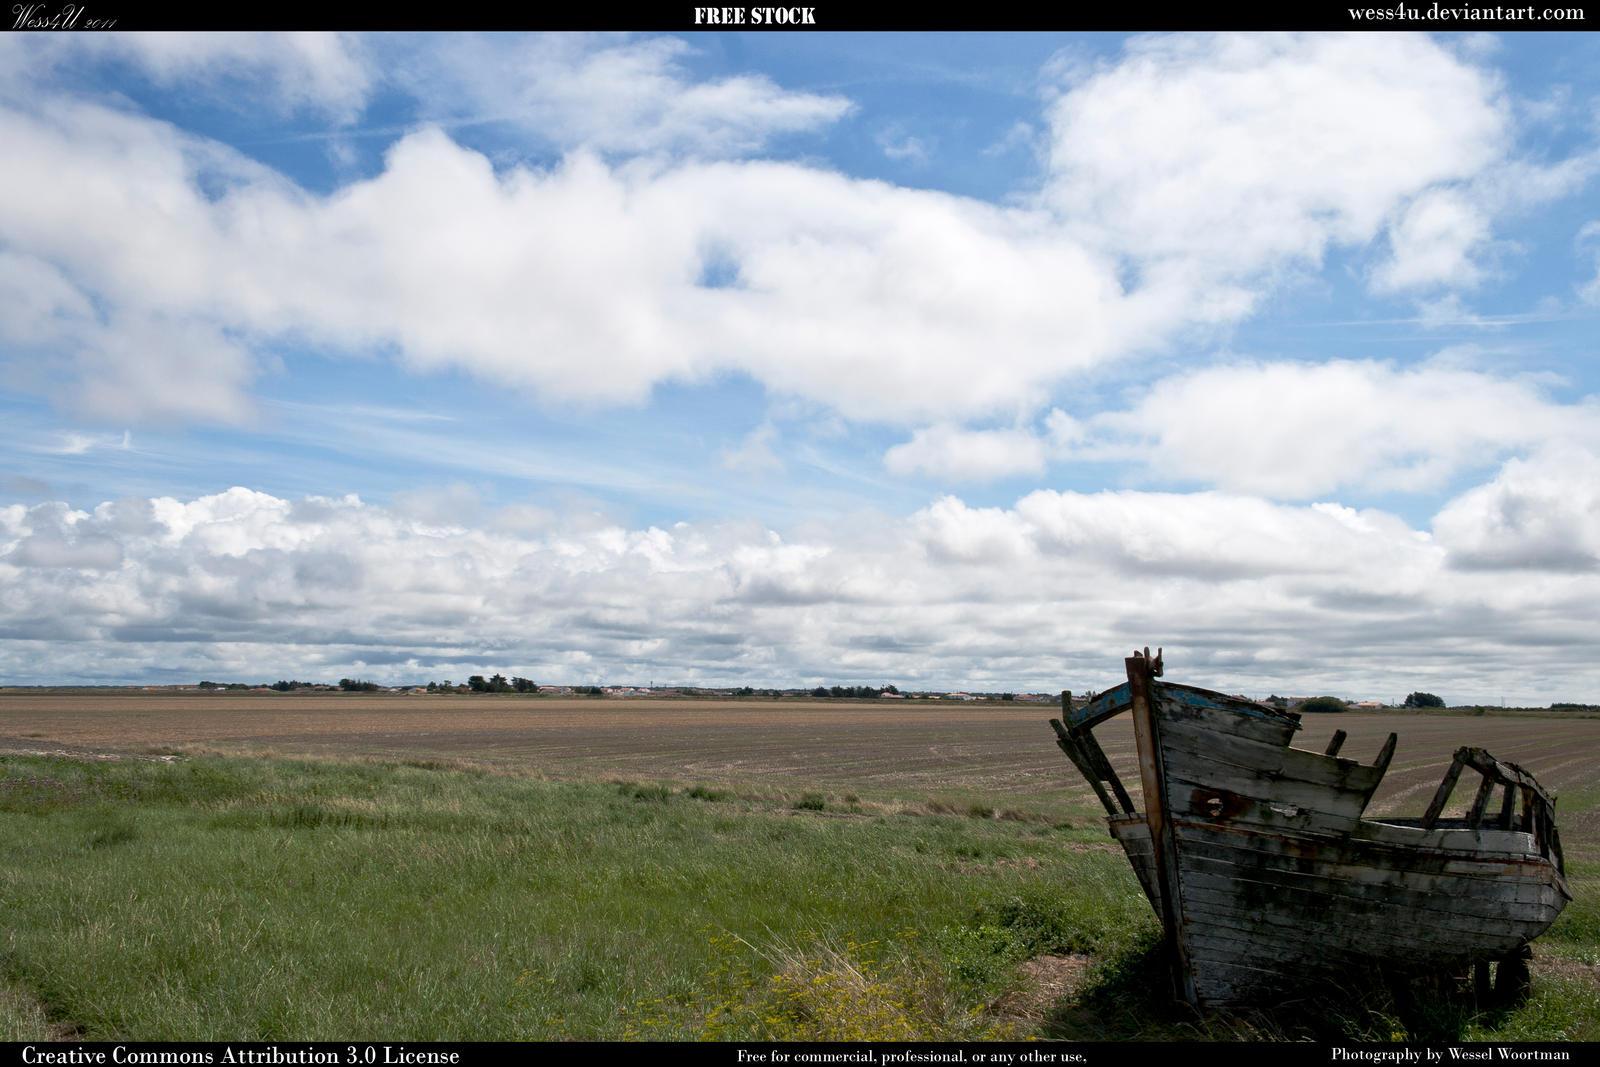 Landscape 6 by Wess4u